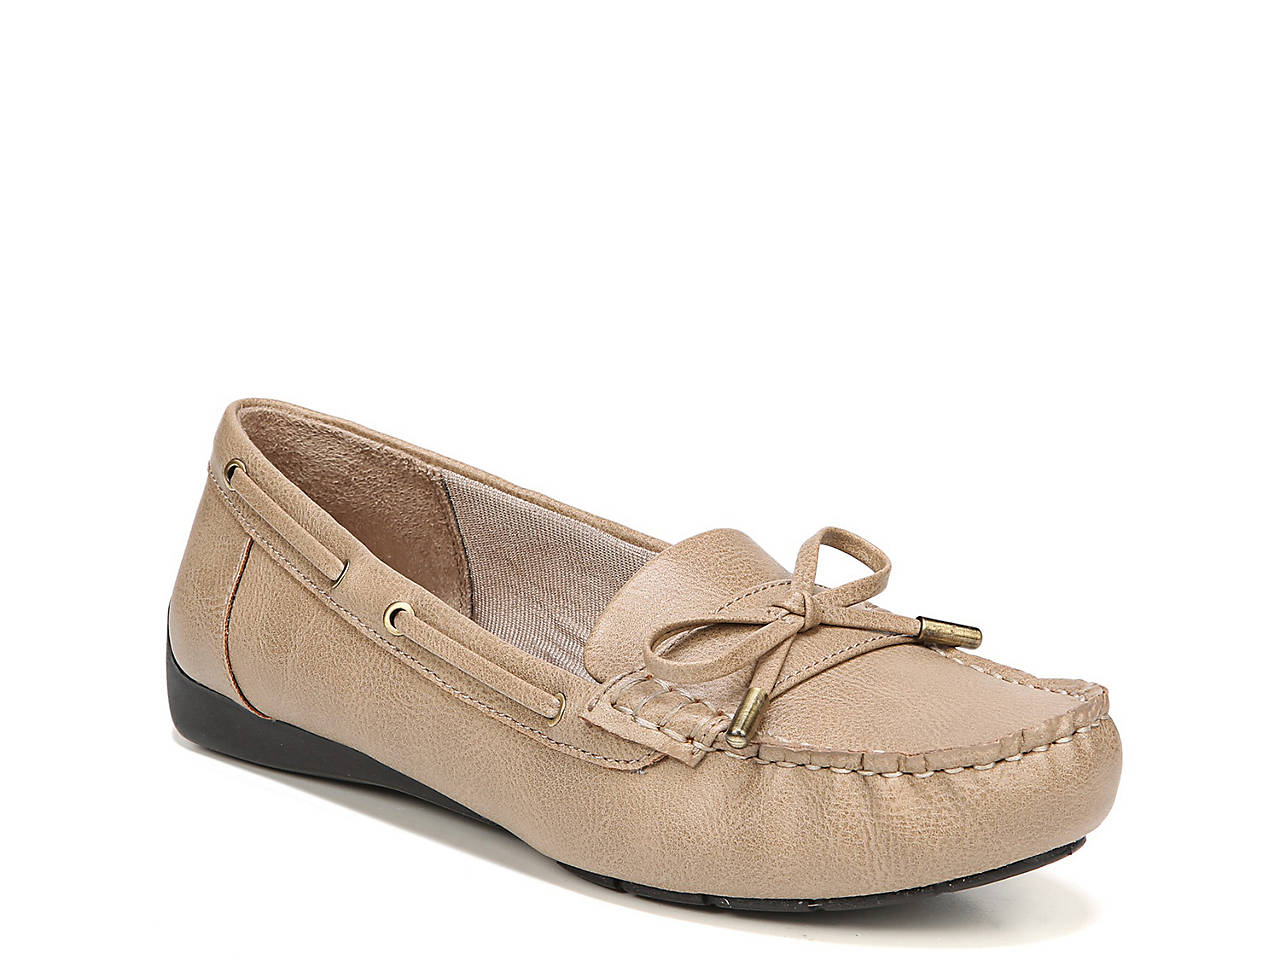 197f4561c50 LifeStride Valor Moccasin Women s Shoes